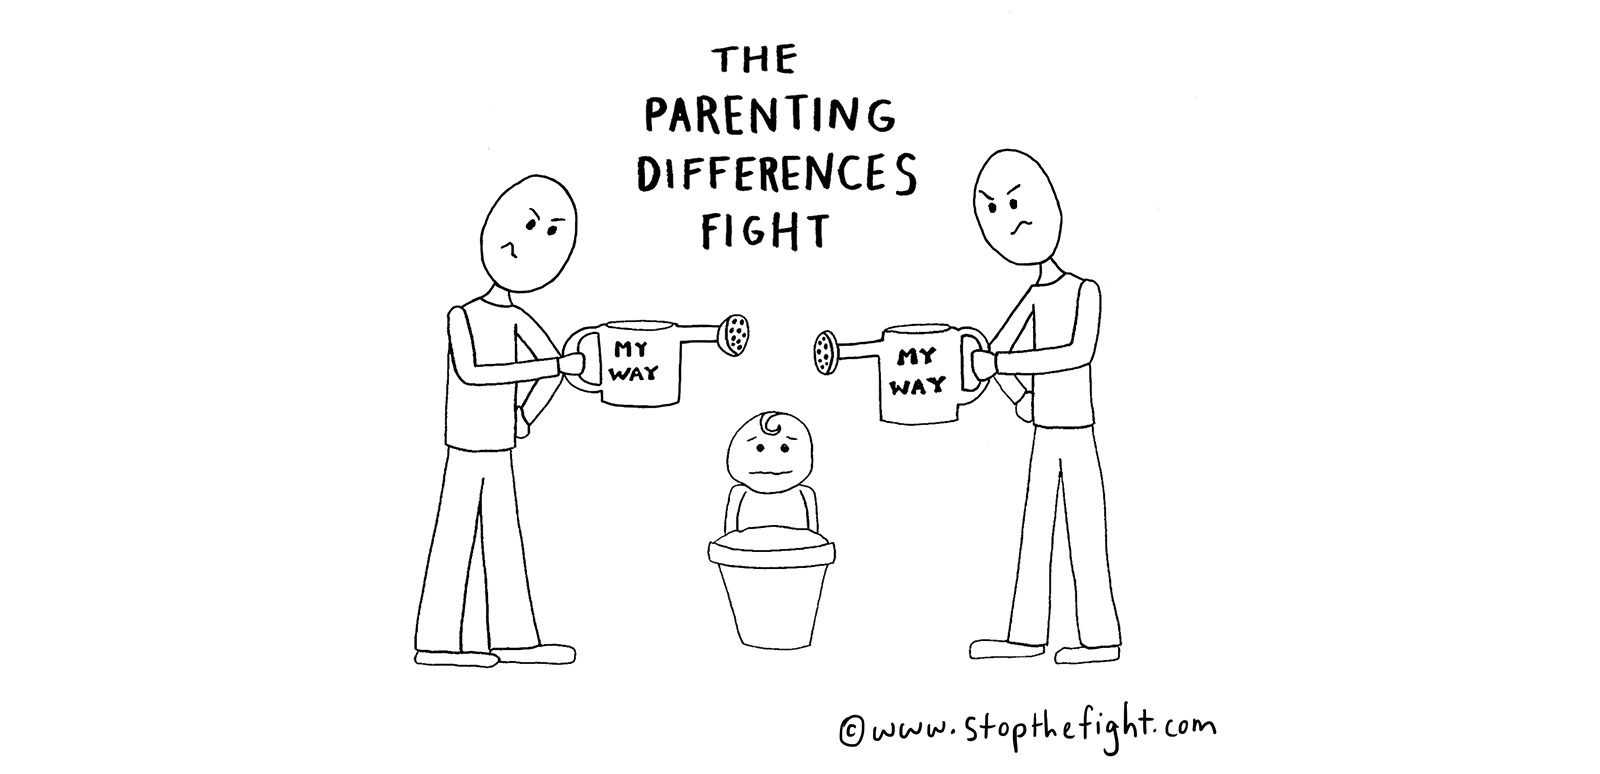 ParentingDifferencesFightNoBox_copyright